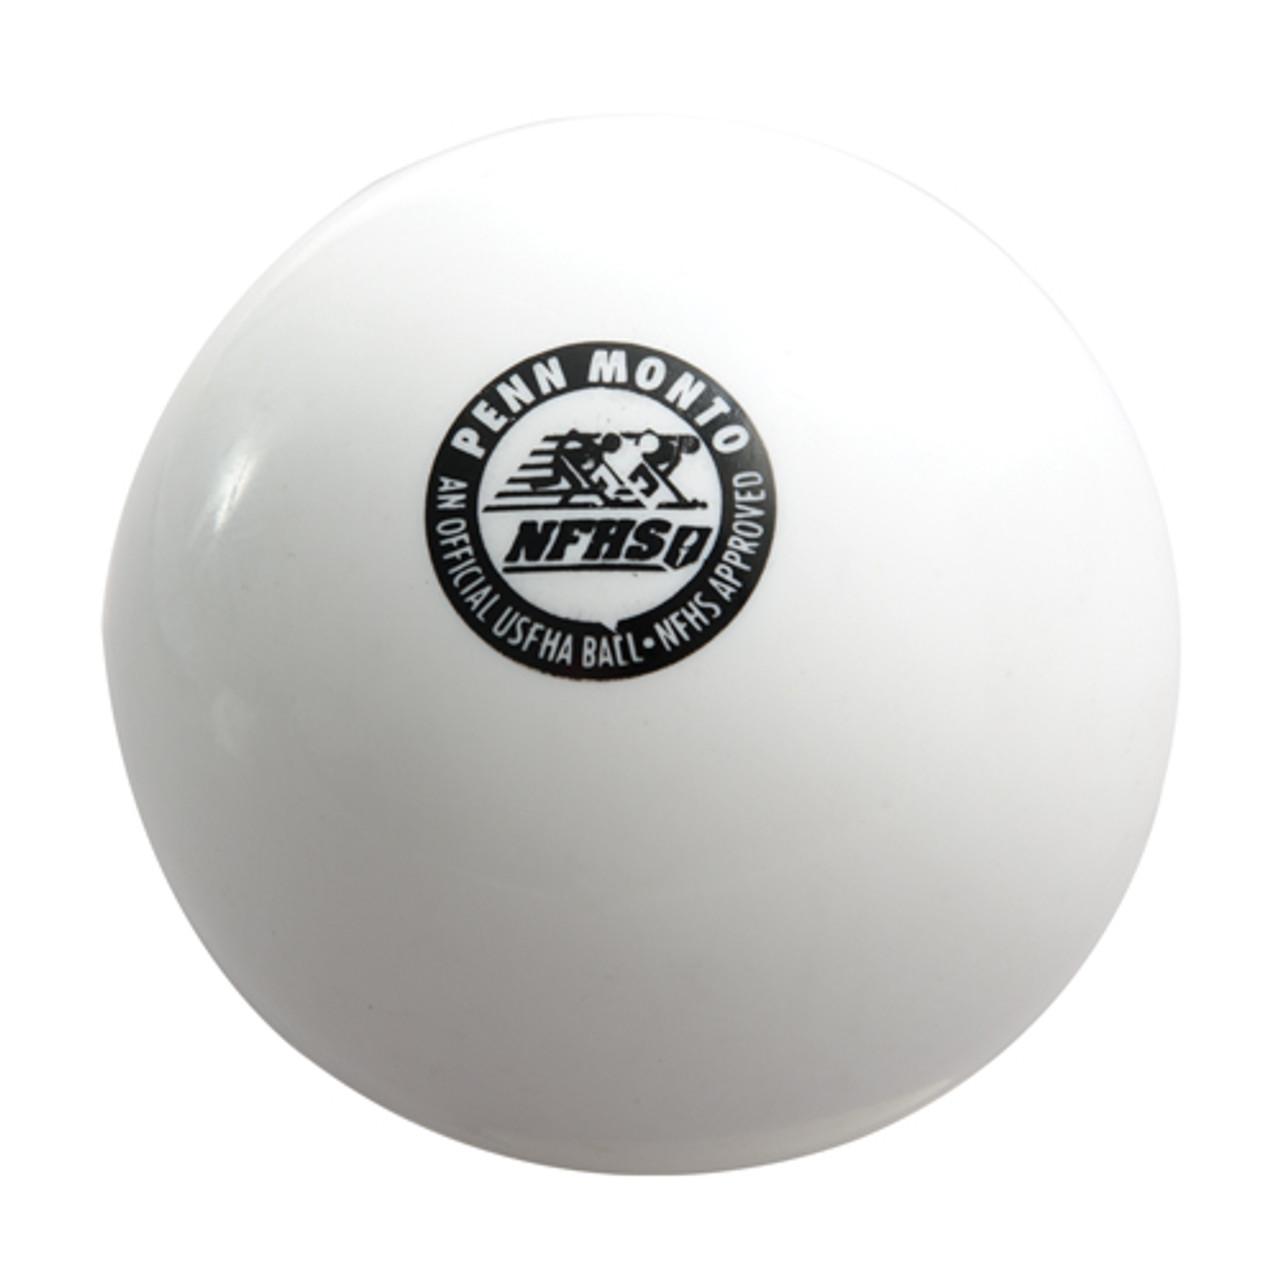 Penn Monto Field Hockey Ball